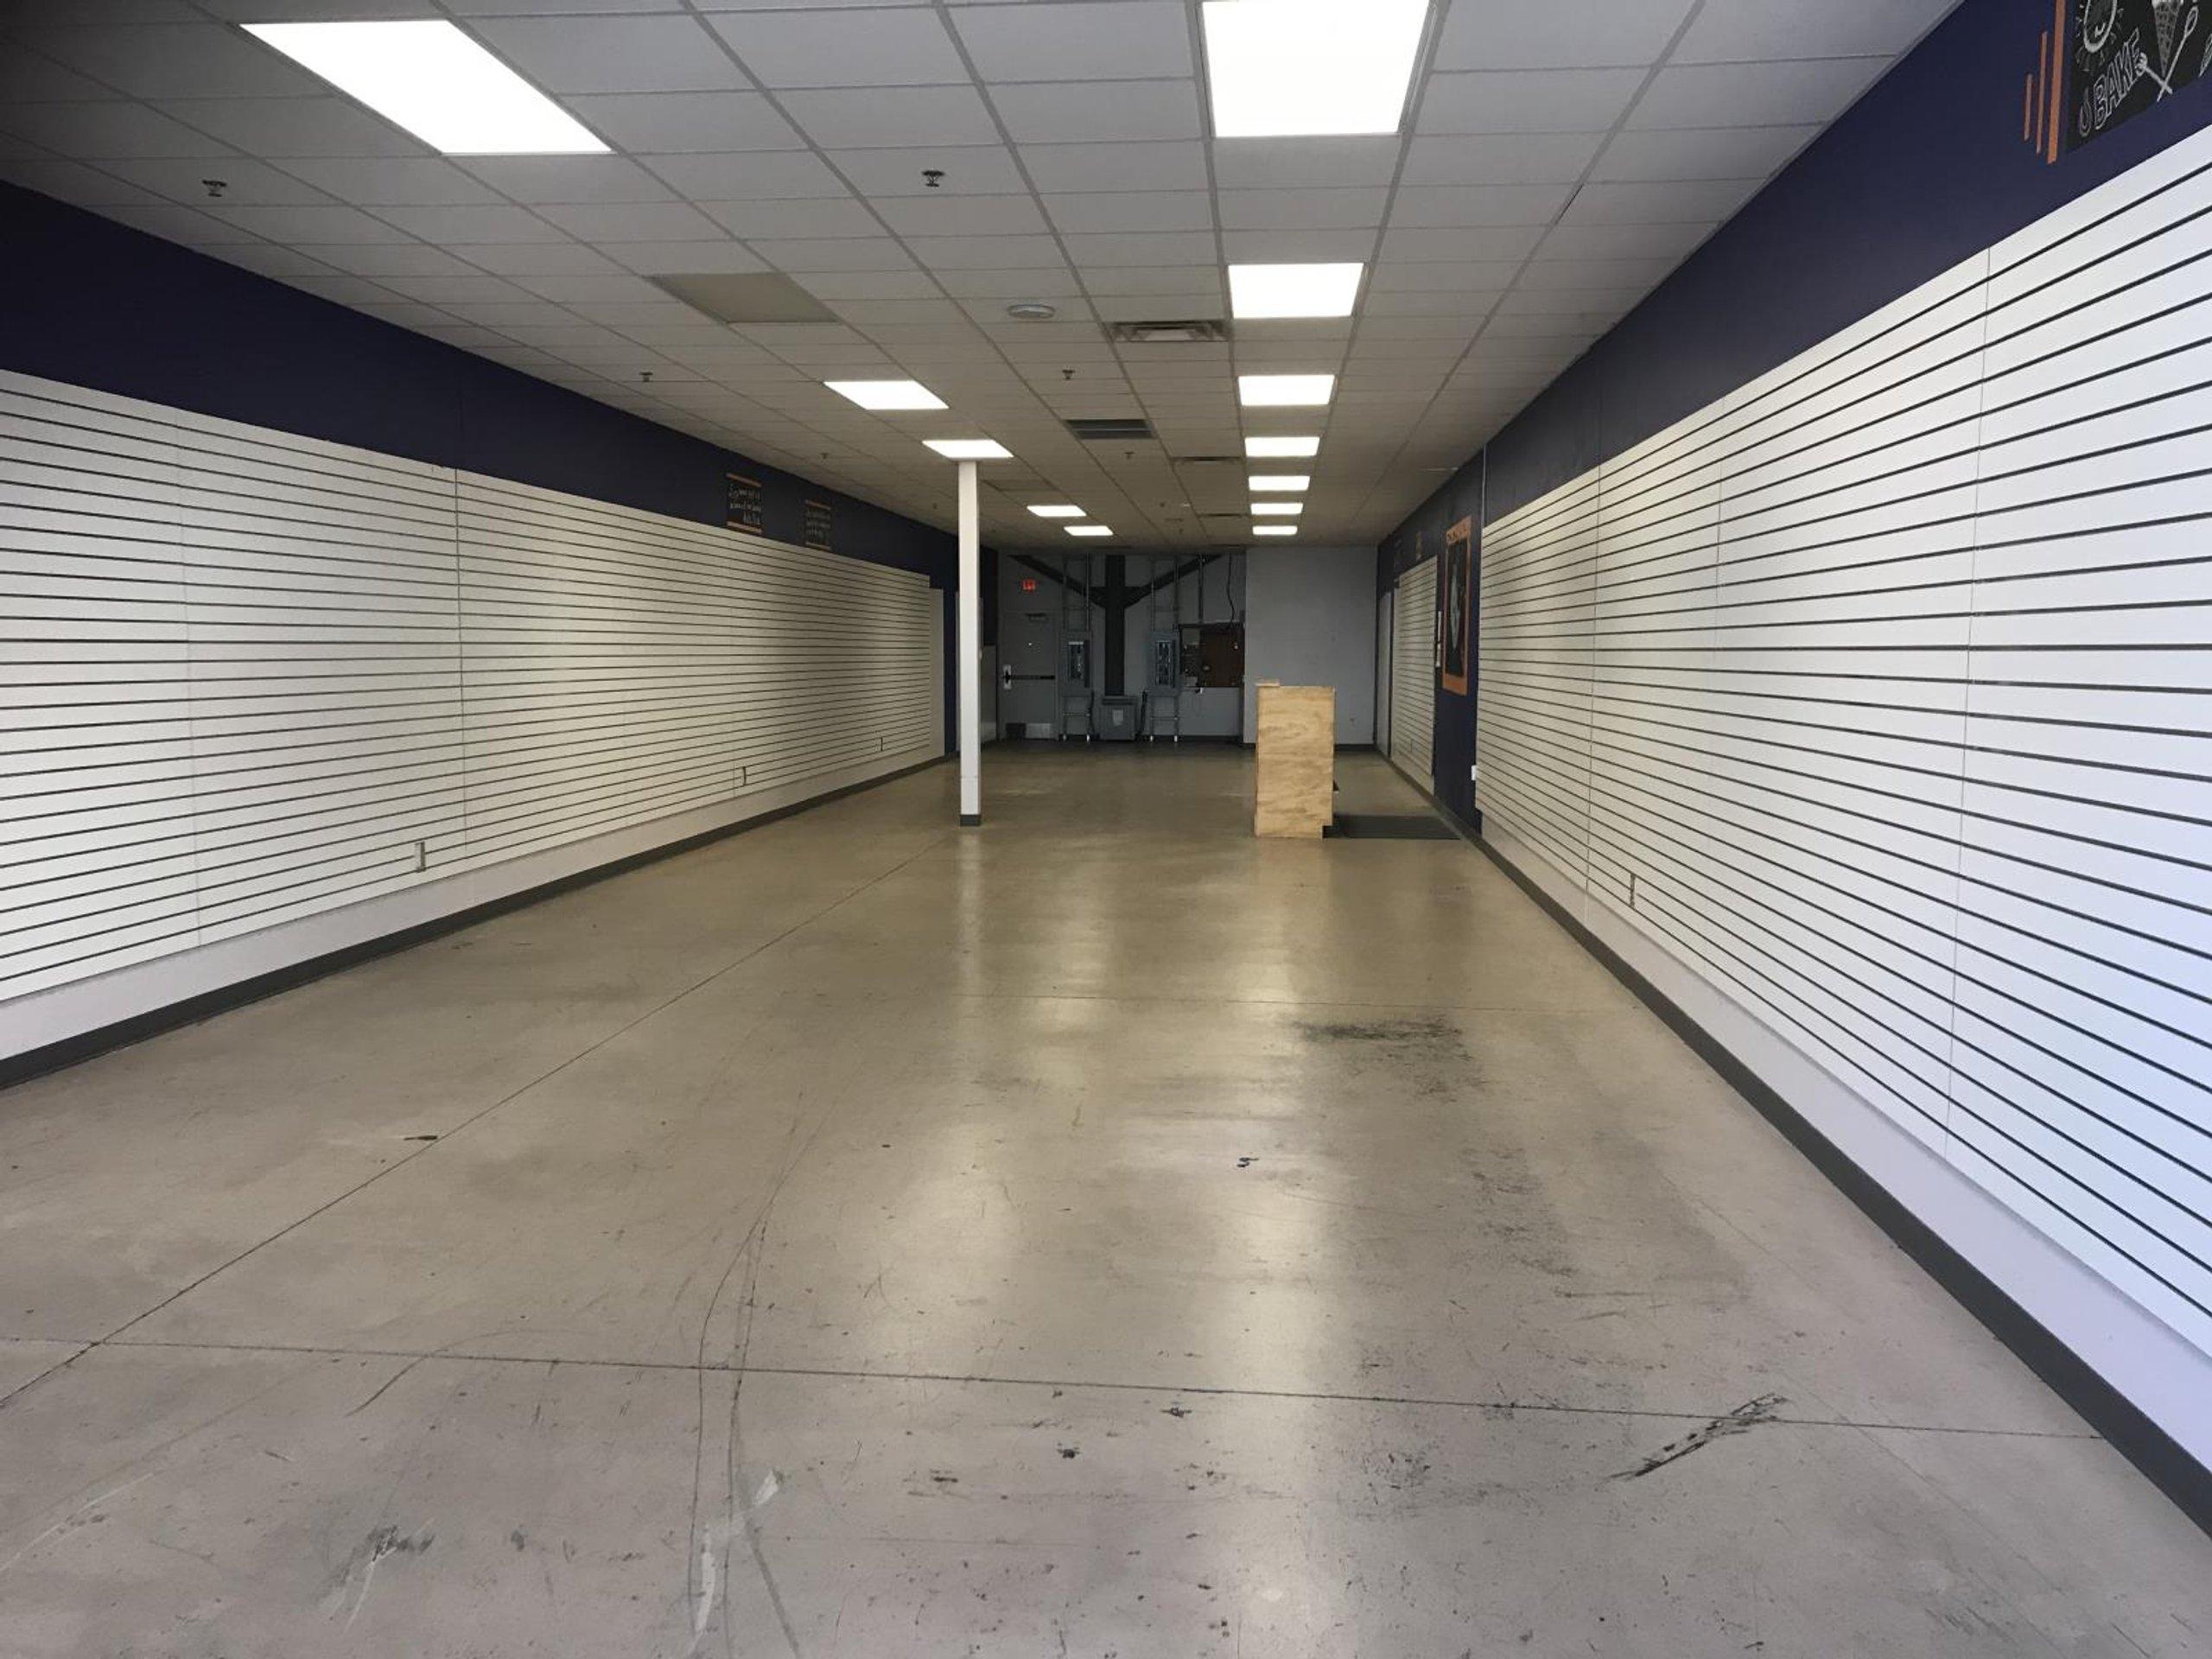 75x27 Warehouse self storage unit